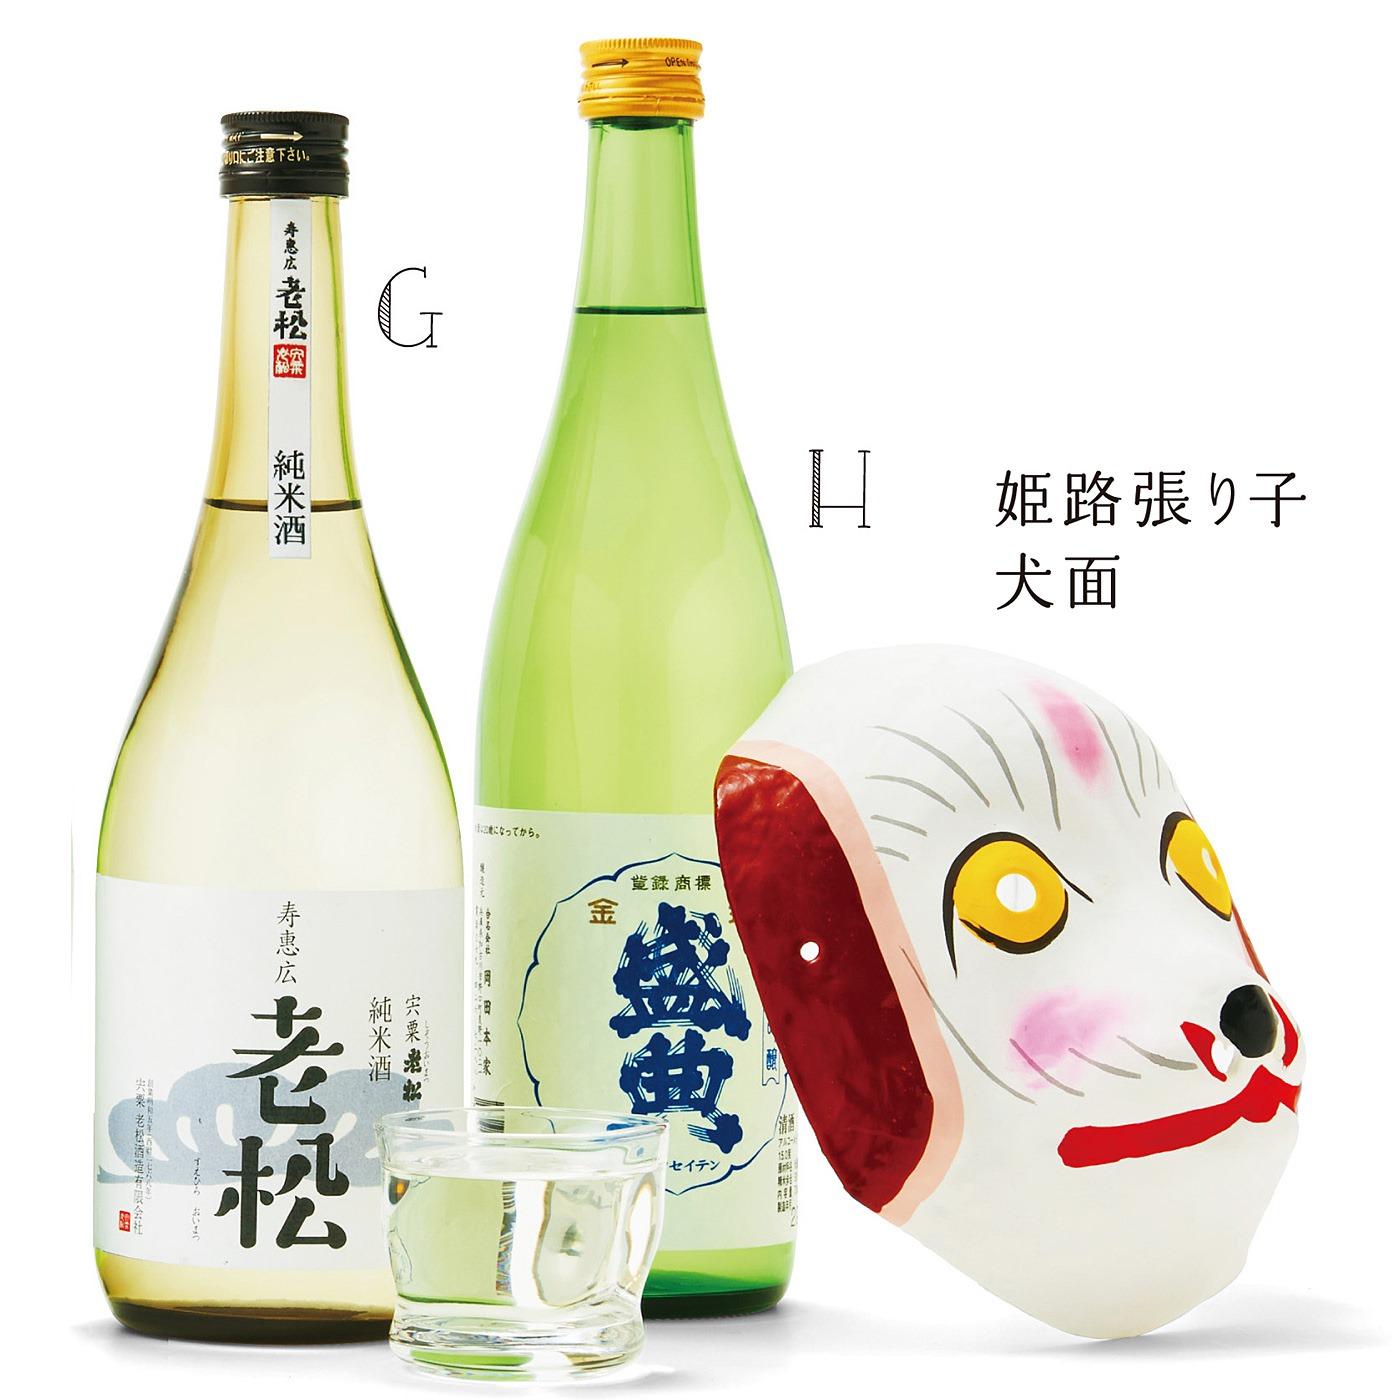 G. 老松 純米 H. 盛典 純米吟醸